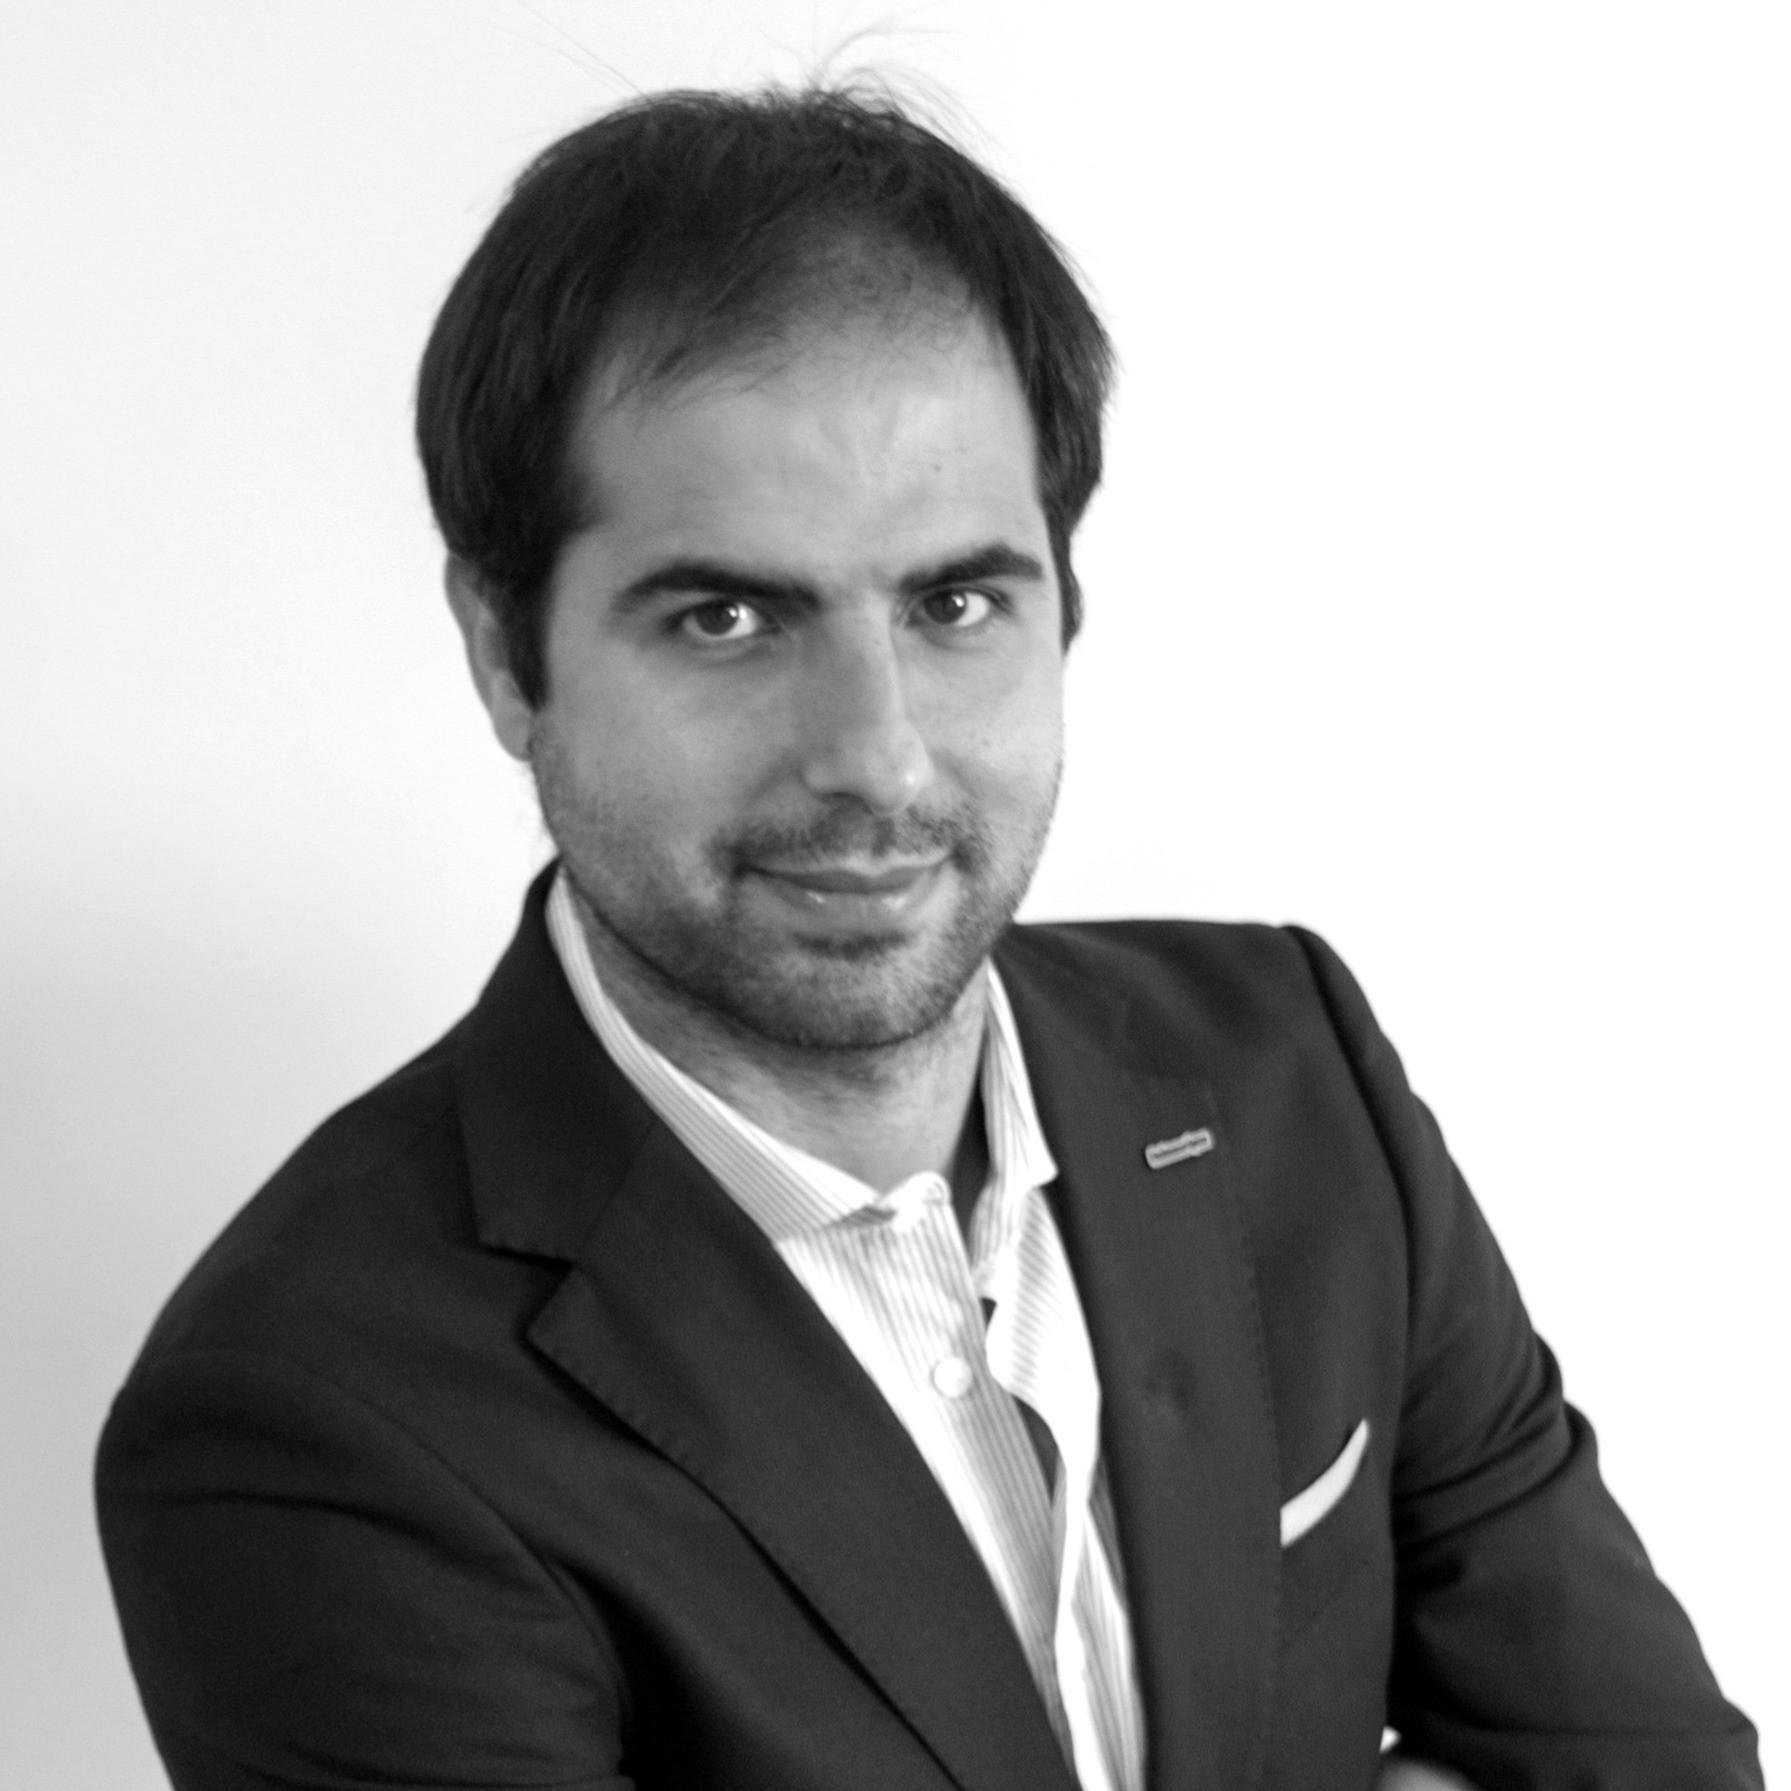 Miguel Pina Martins